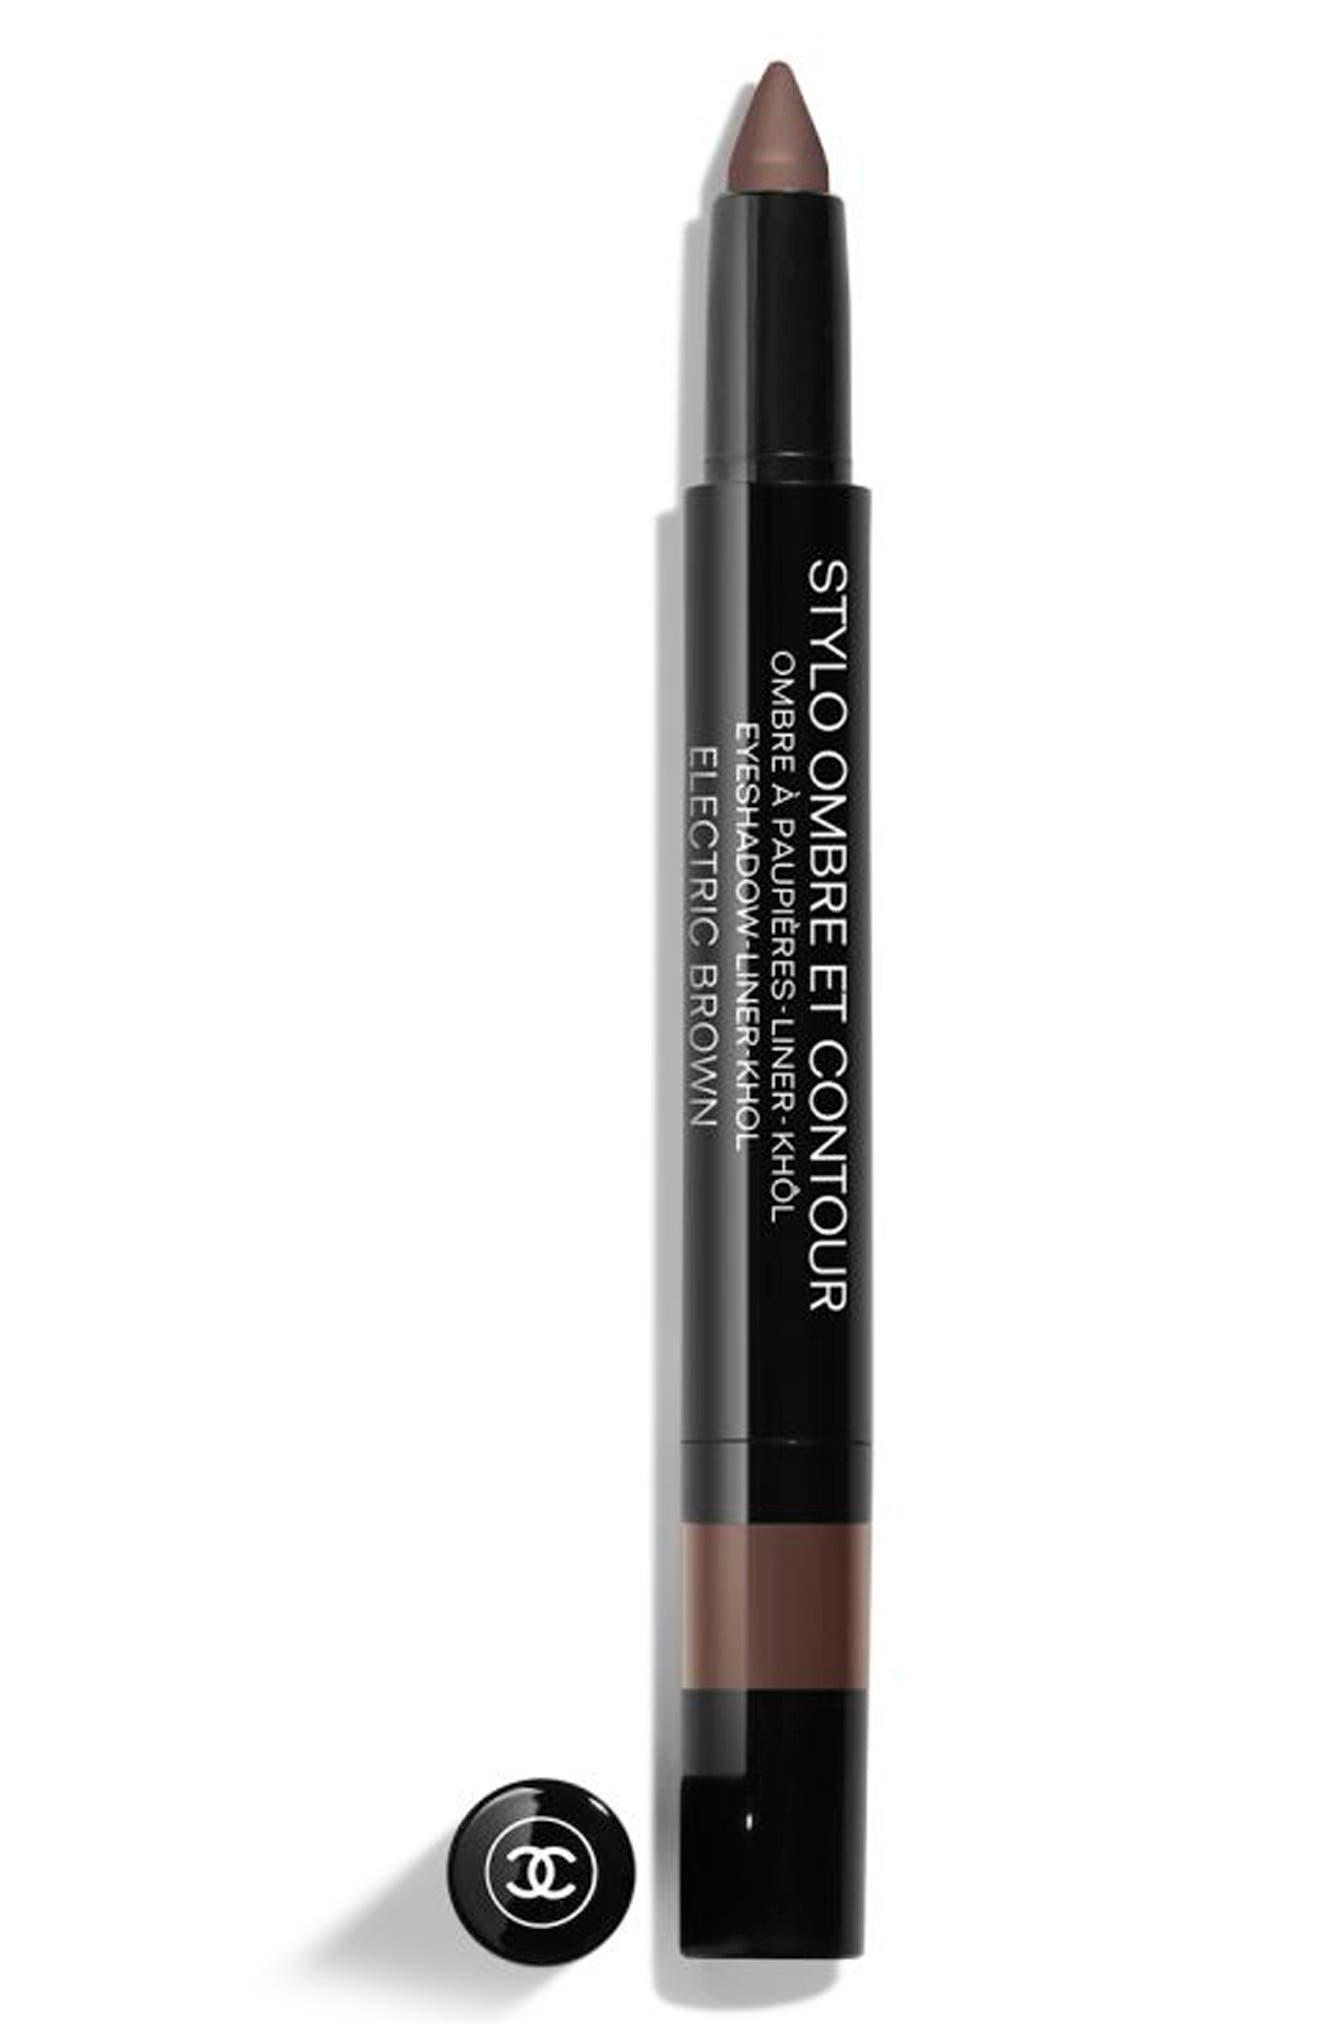 CHANEL STYLO OMBRE ET CONTOUR Eyeshadow Liner Khôl | Nordstrom